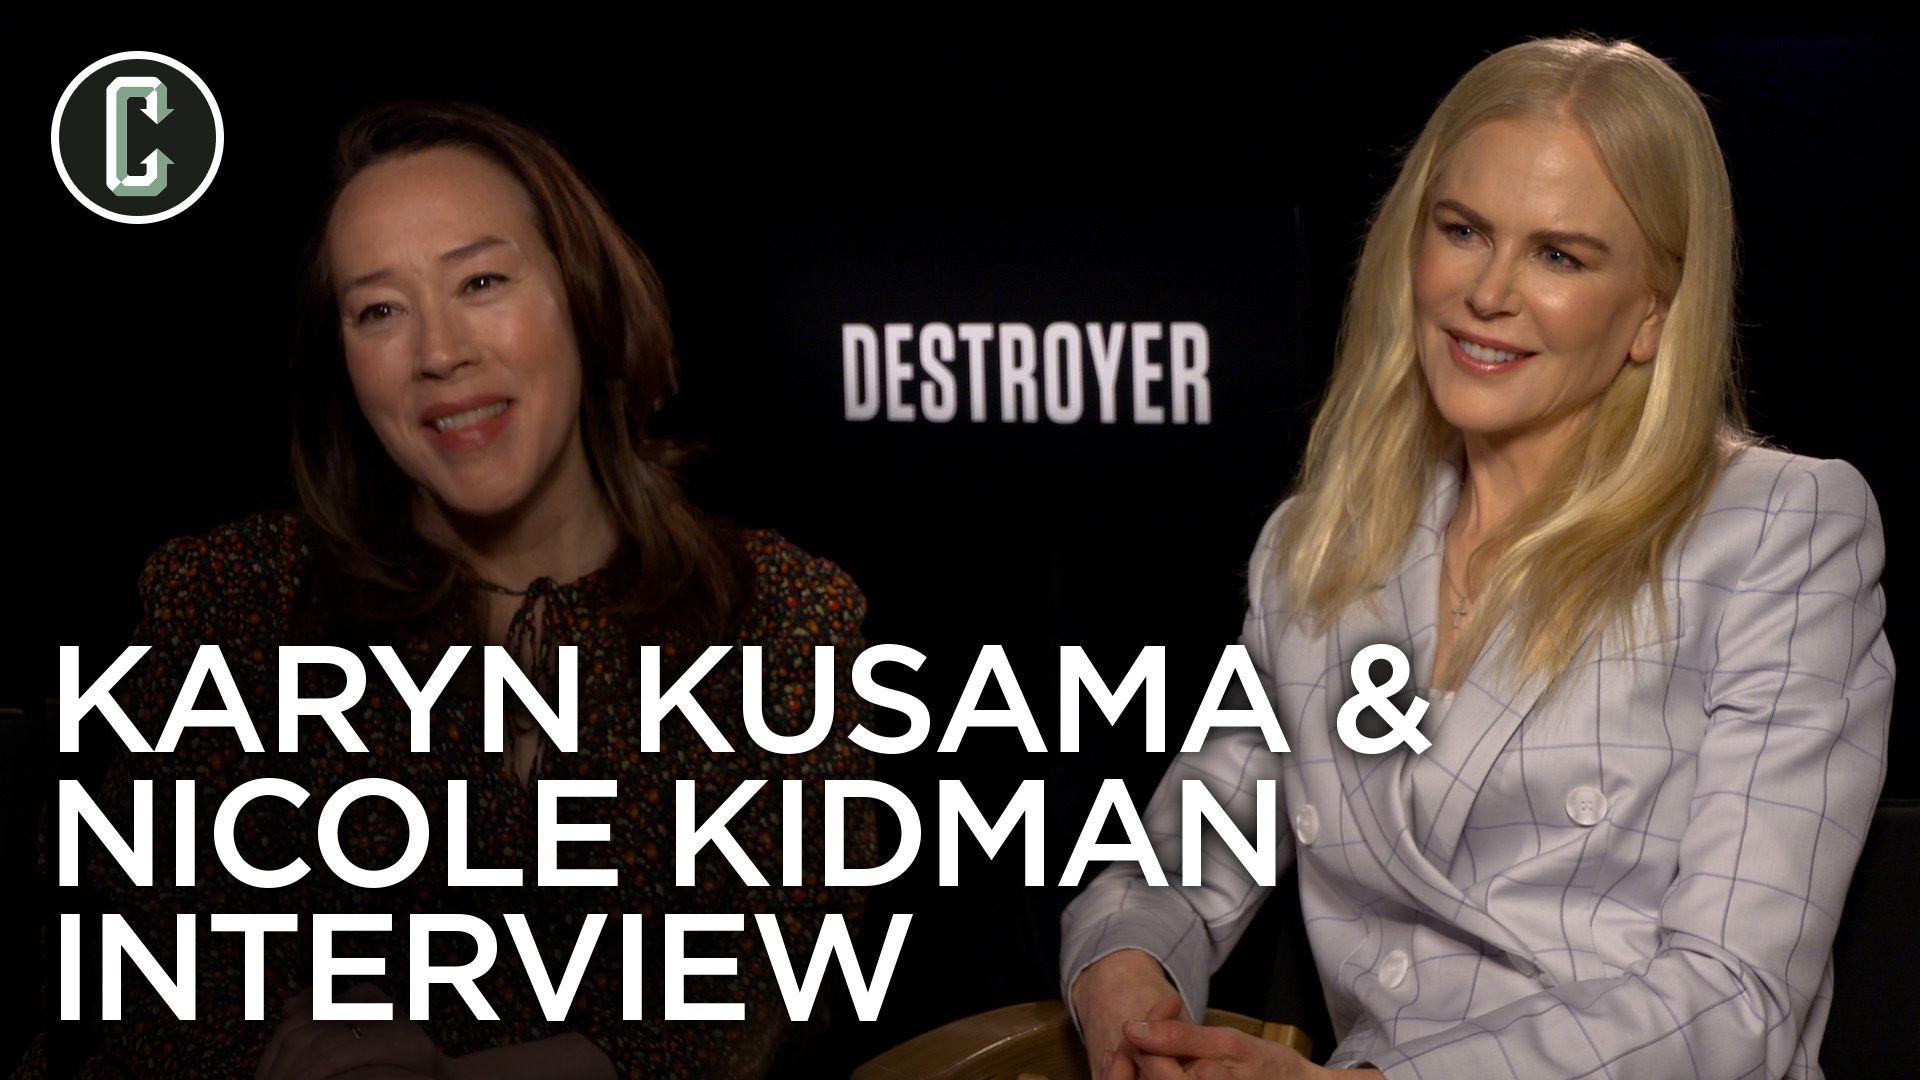 Nicole Kidman and Karyn Kusama on 'Destroyer', Realistic Violence, & Non-Linear Storytelling